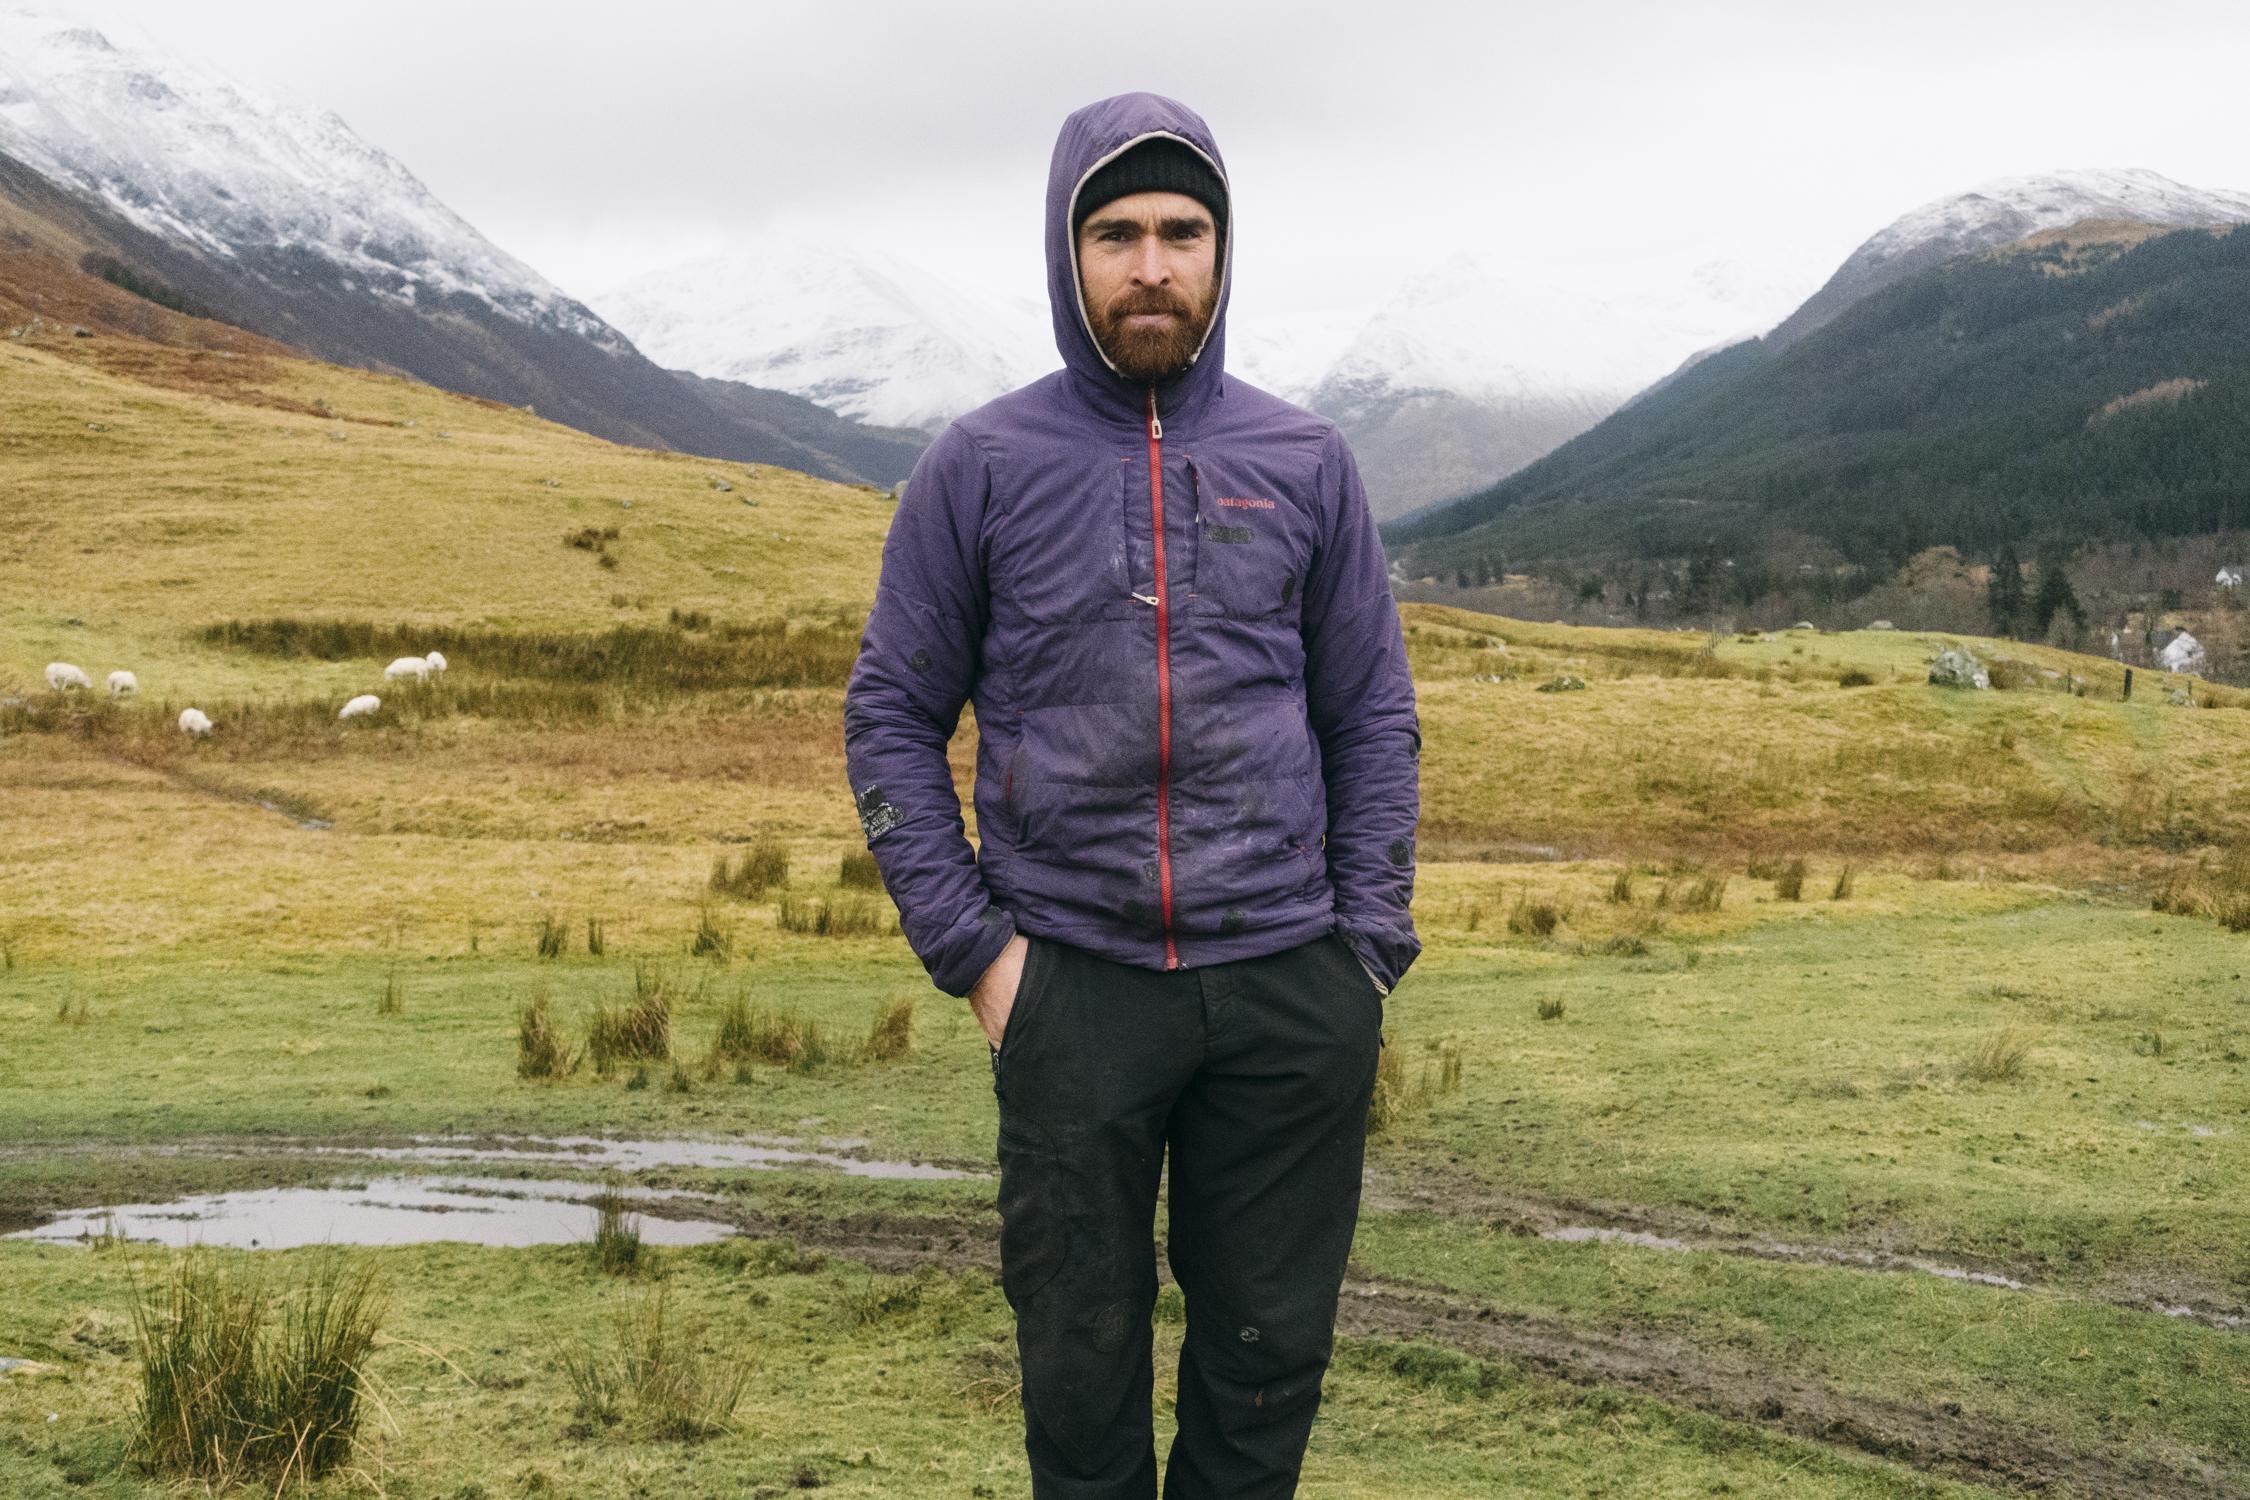 Sean Villanueva O'Driscoll on set in Northern Scotland for the next Worn Wear Film.